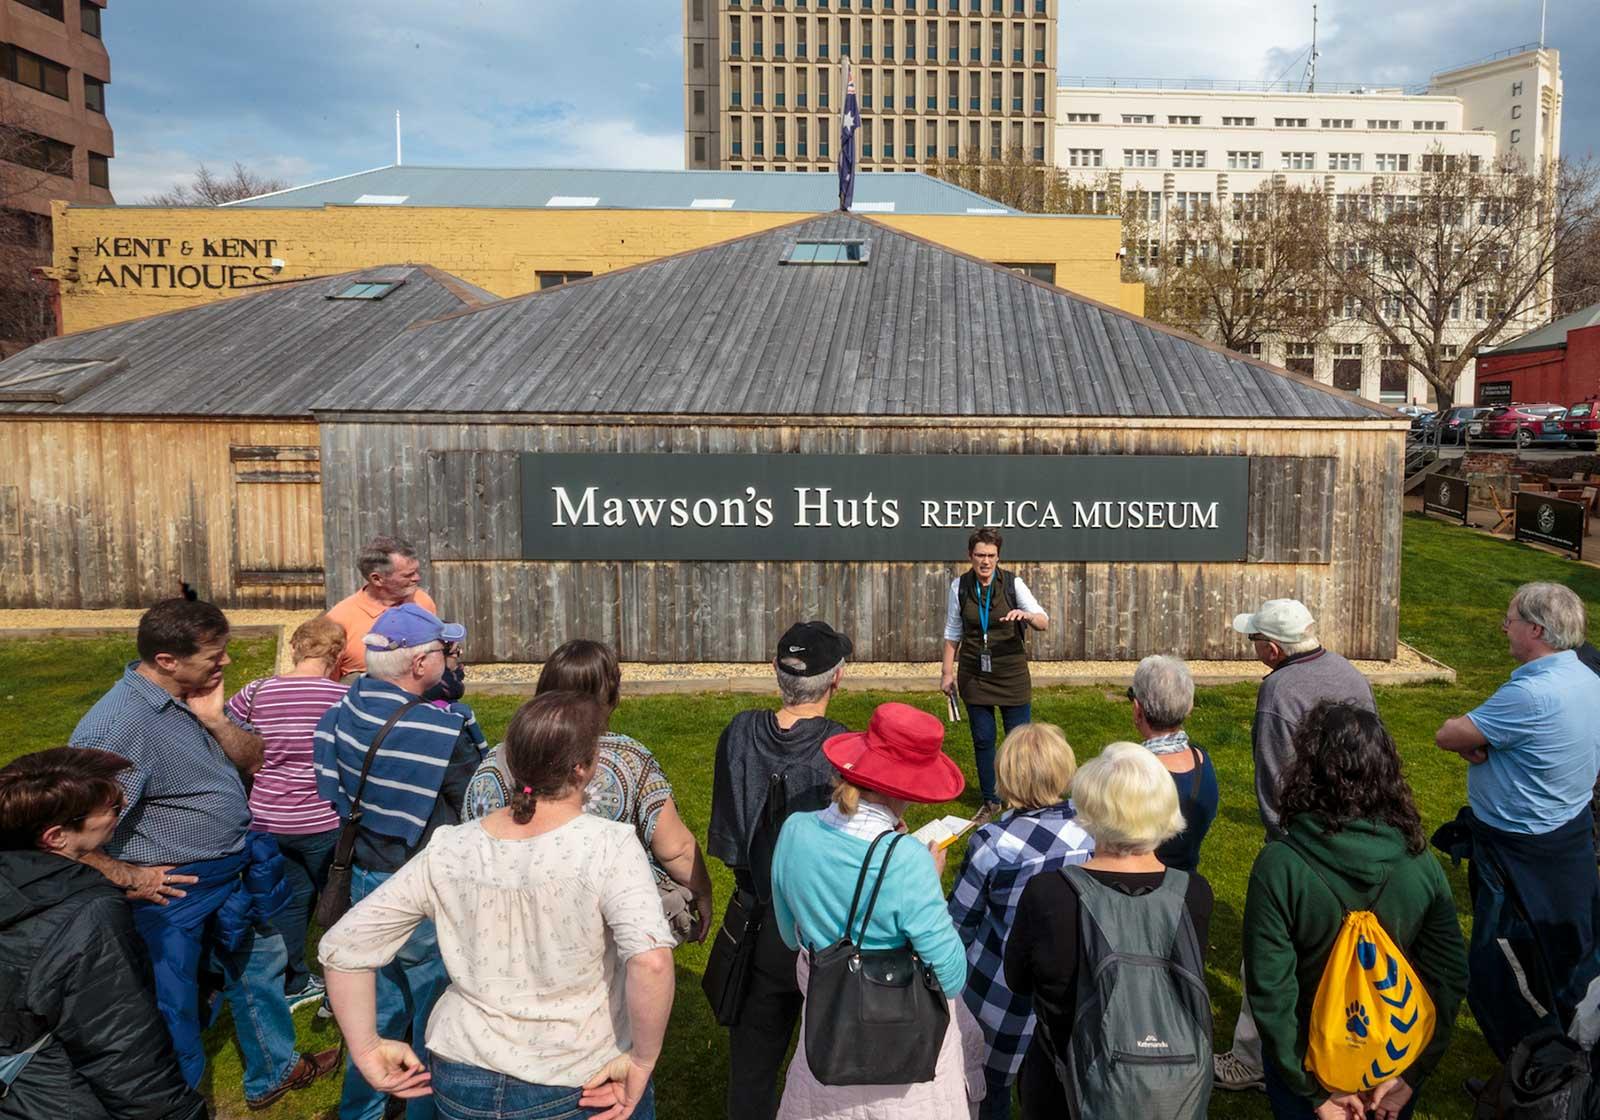 Australian Antarctic Festival, Antarctic Festival, Hobart Festival, Festival Hobart, Mawson's Huts, Mawson's Huts Foundation, Hobart Tourism, Mawson's Huts Replica Museum